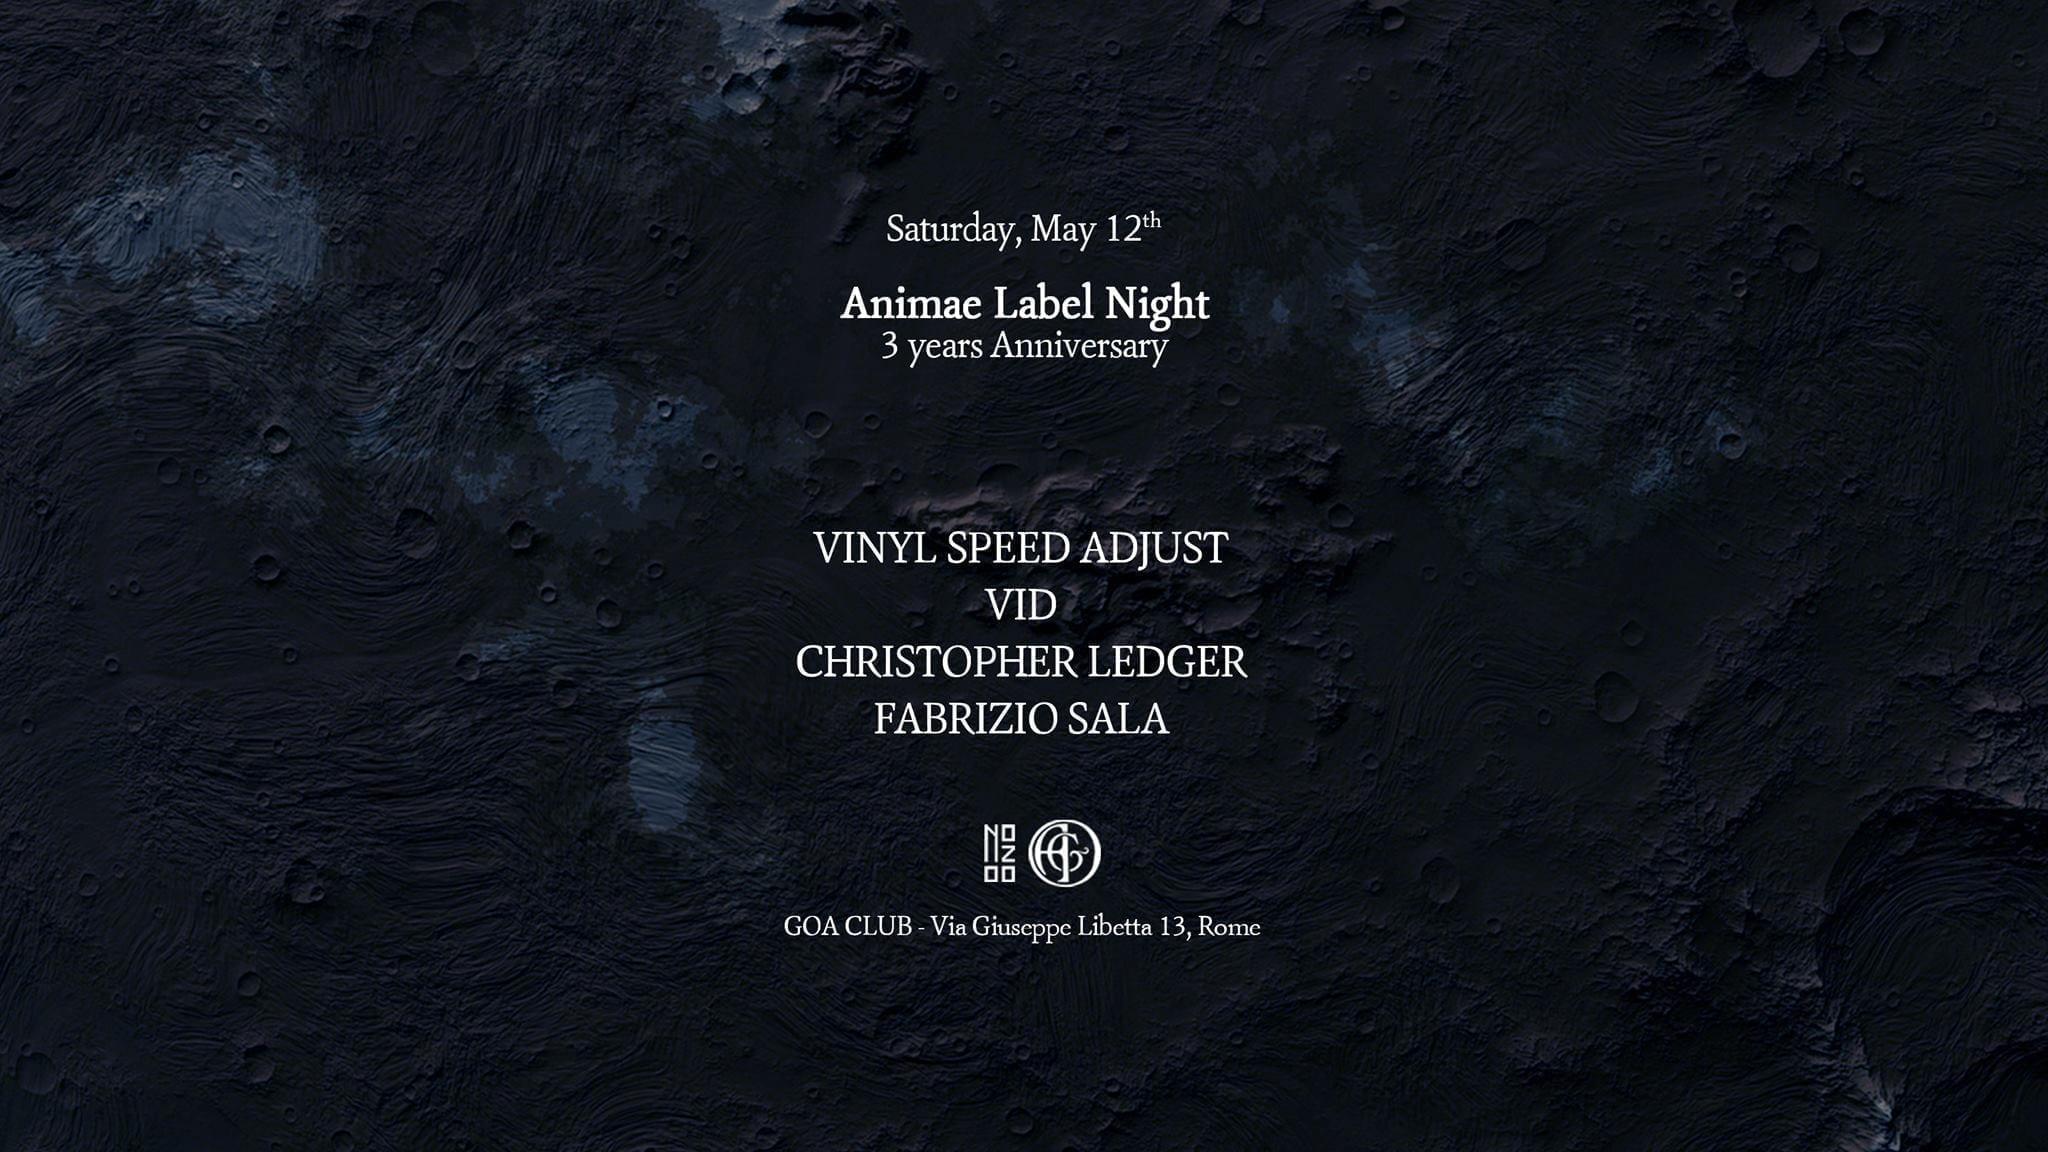 Animae Label Night x Goa Club